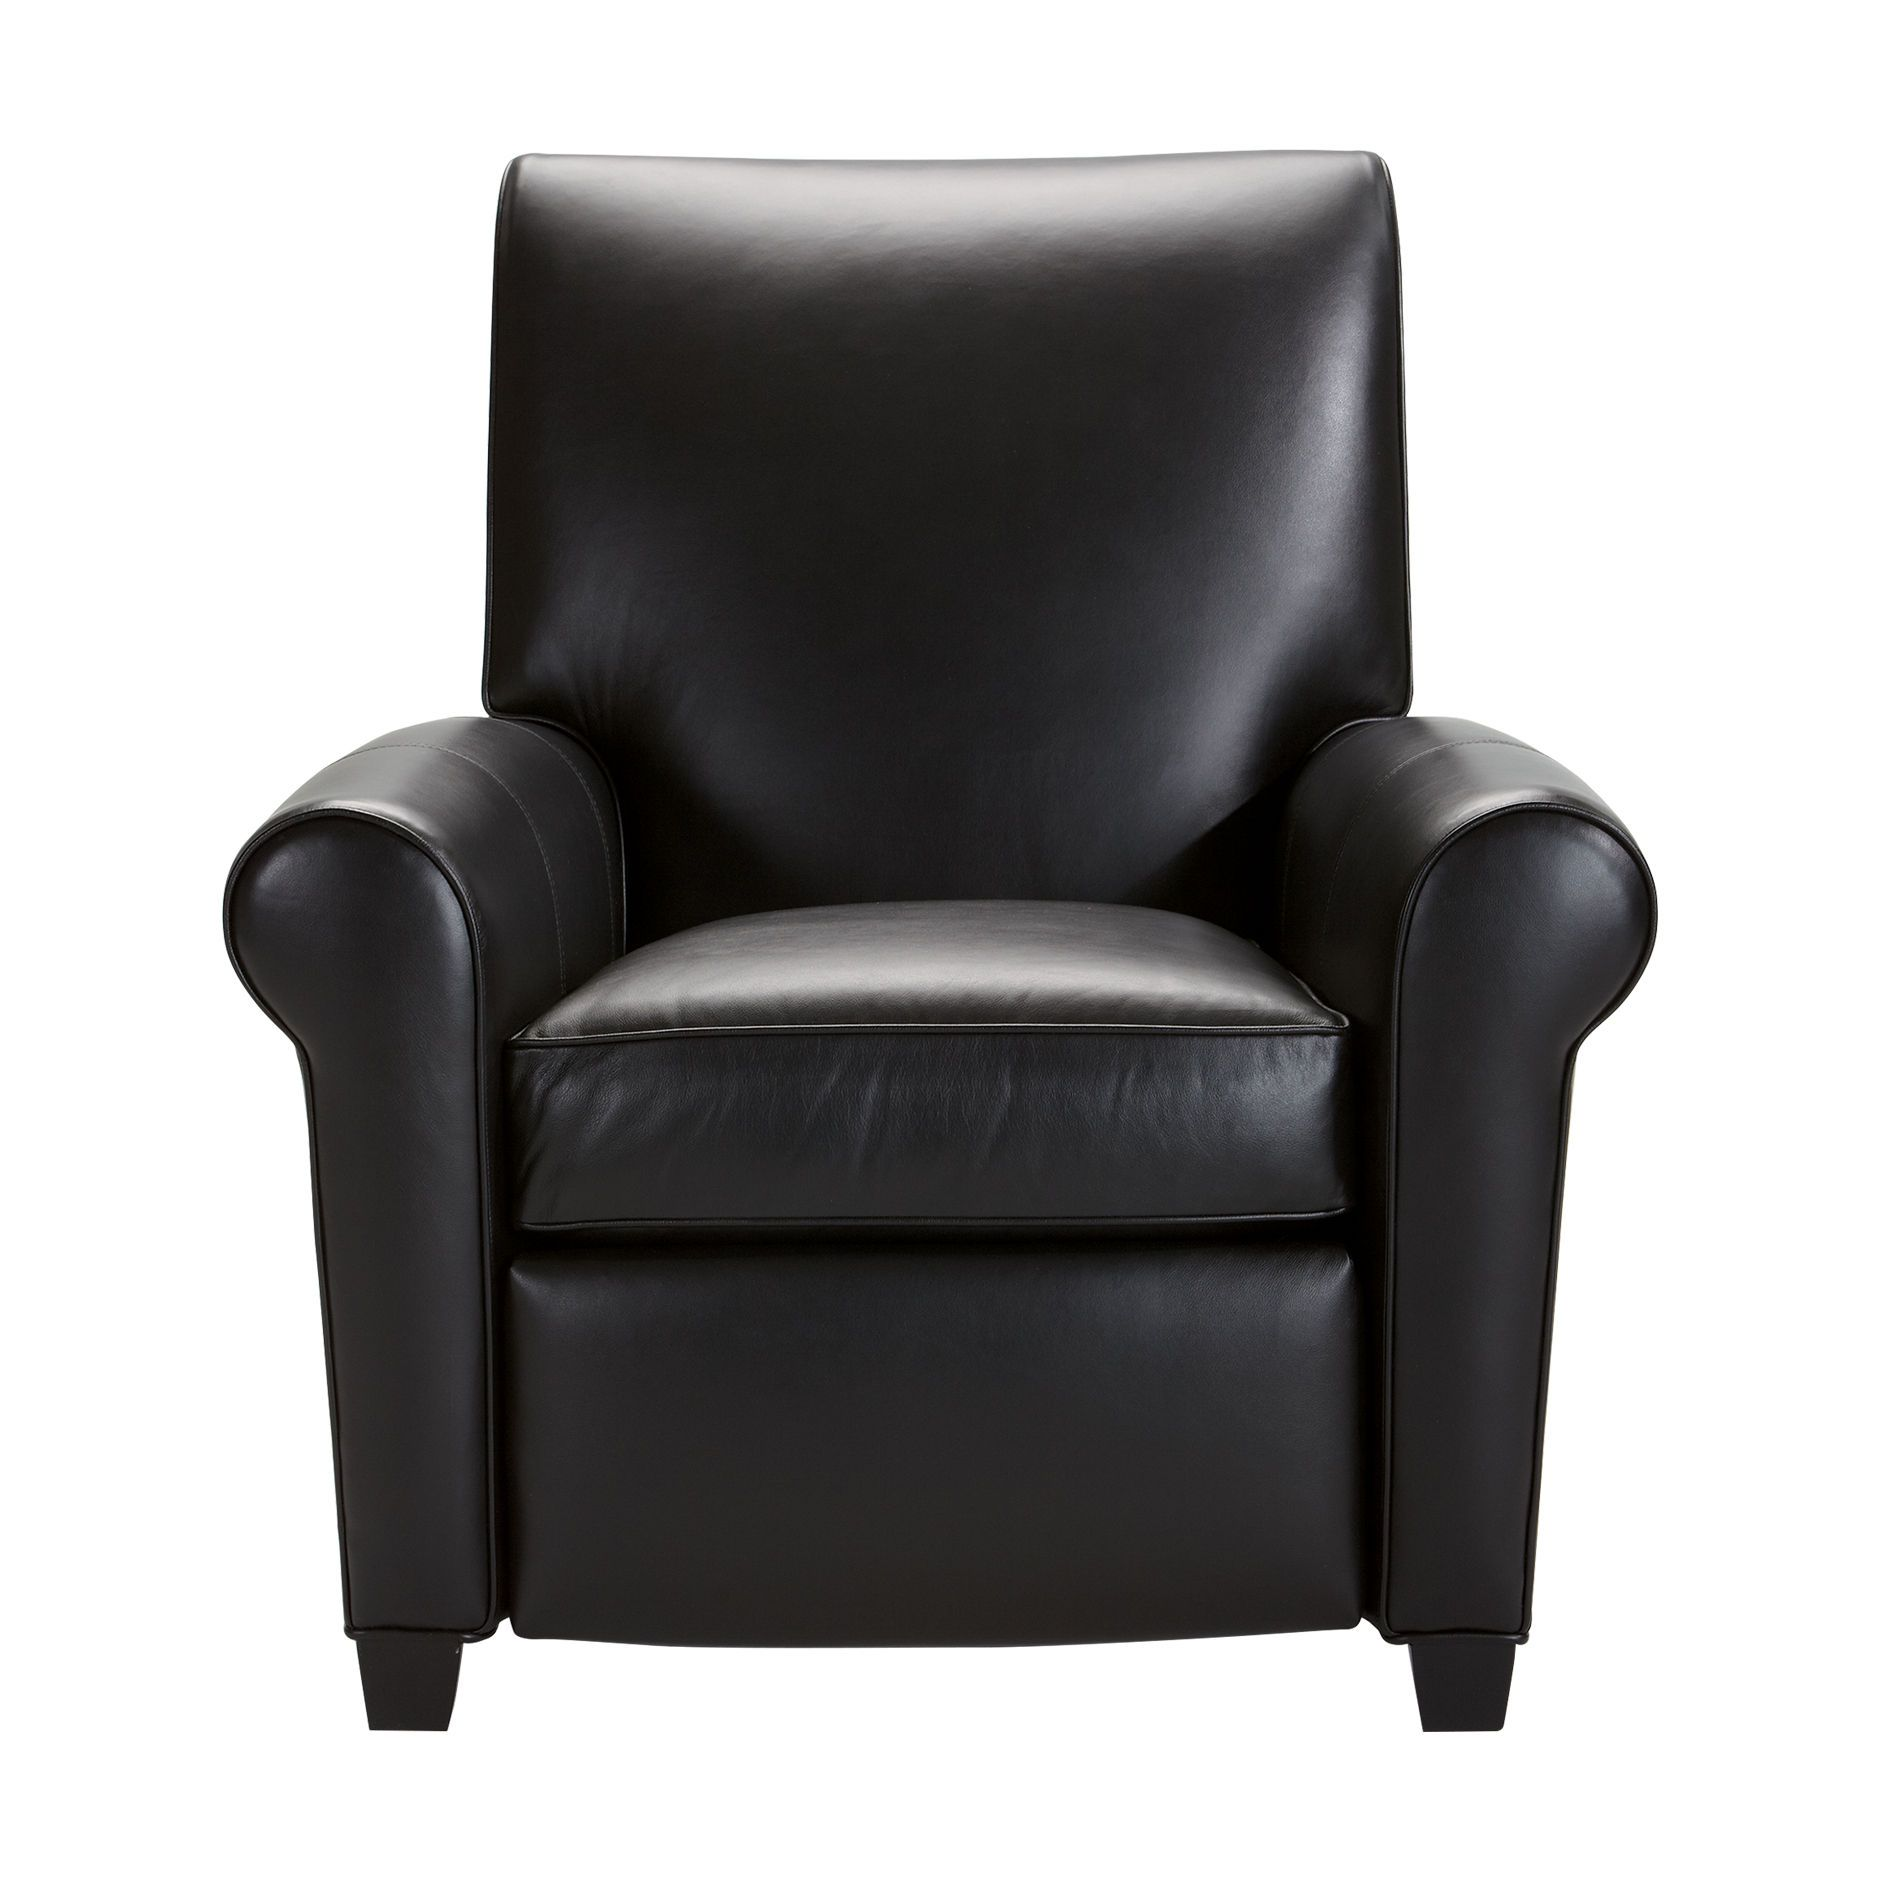 Miraculous Bentley Express Leather Recliner Ethan Allen Us Veneto Short Links Chair Design For Home Short Linksinfo